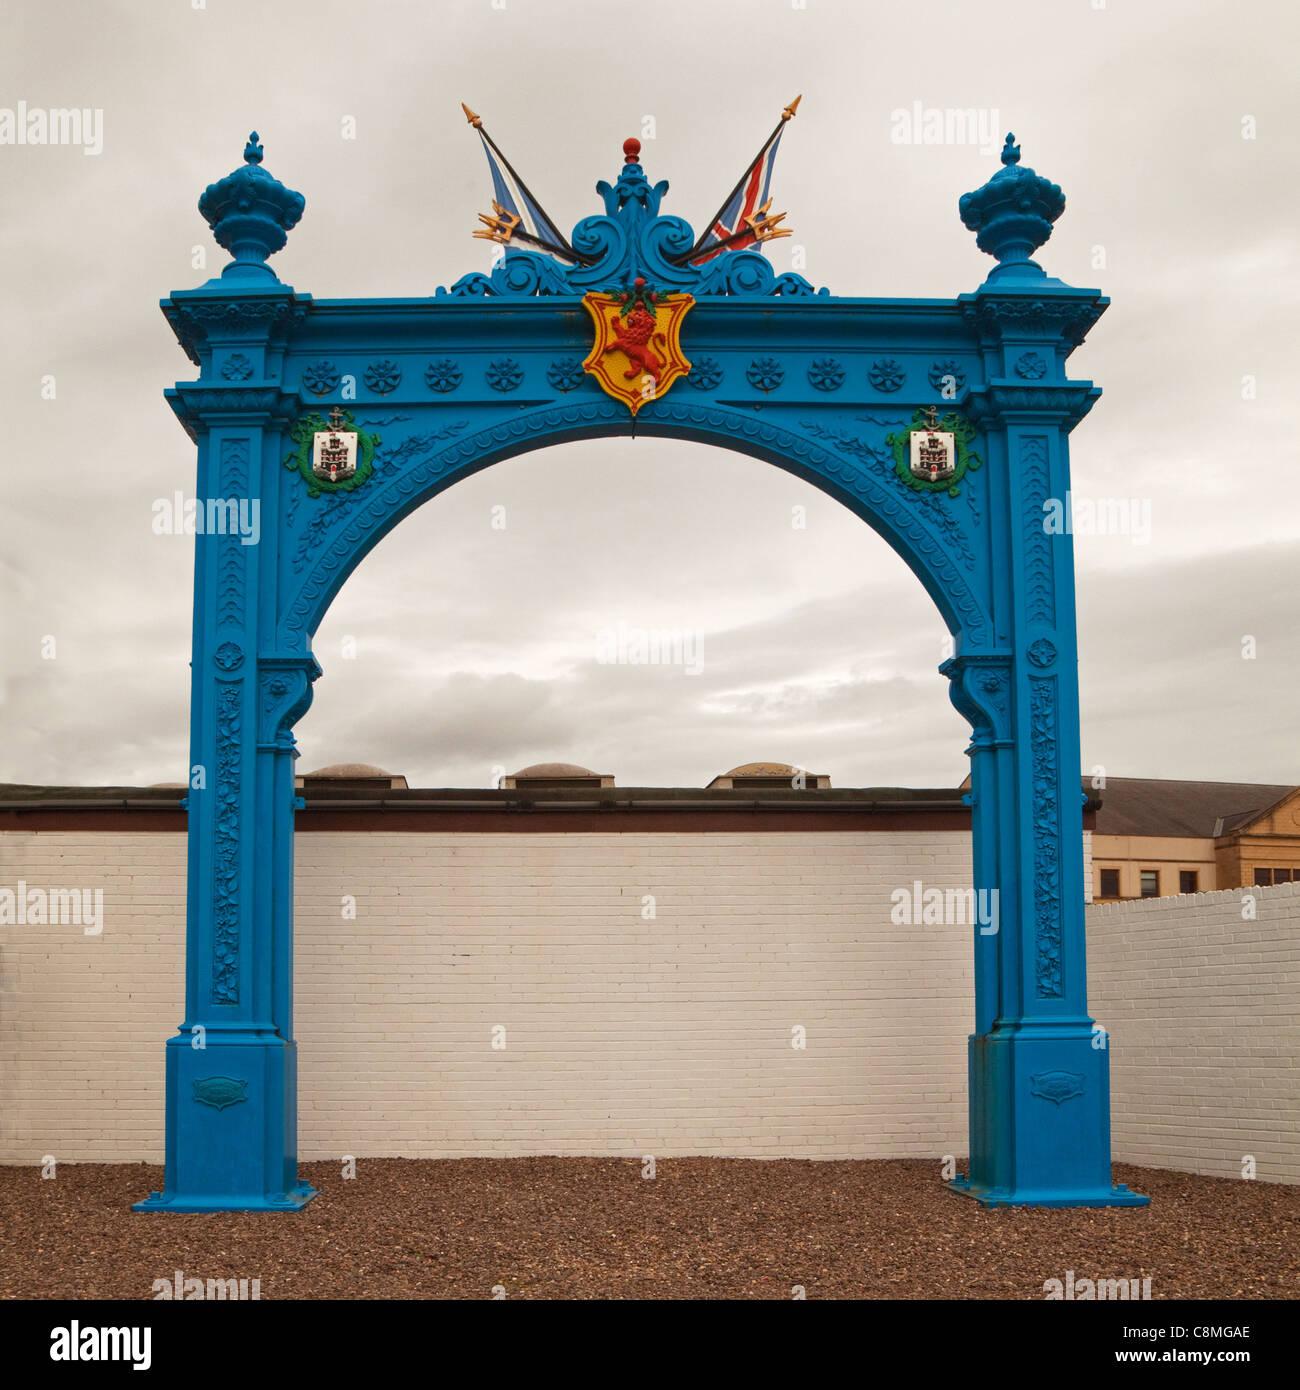 The Grahamston Gate, Carron, Falkirk - Stock Image